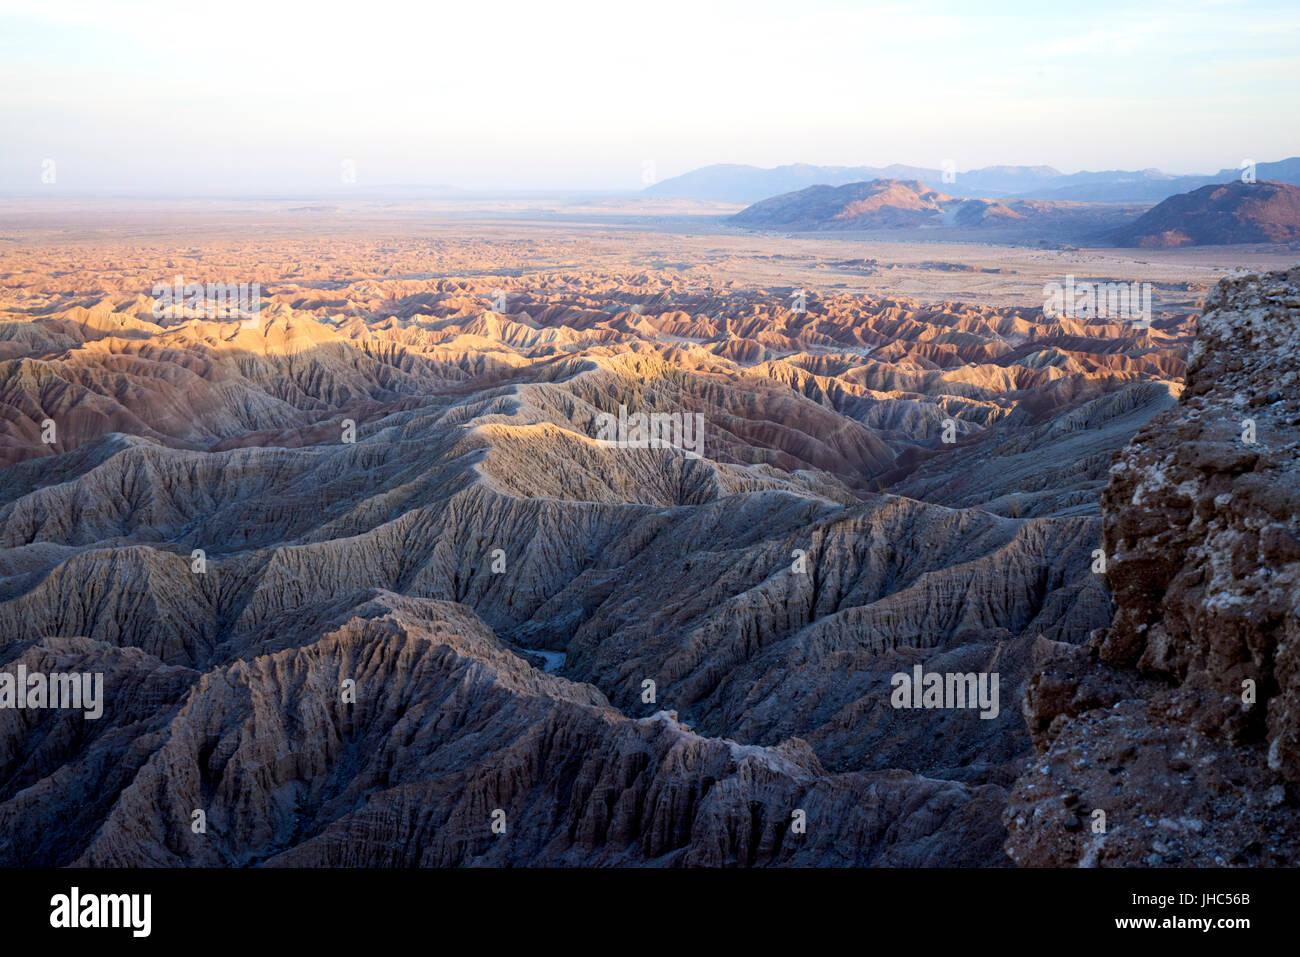 hazy hot vast desert landscape with mountains, ridges, valleys, bathed in evening light - Stock Image